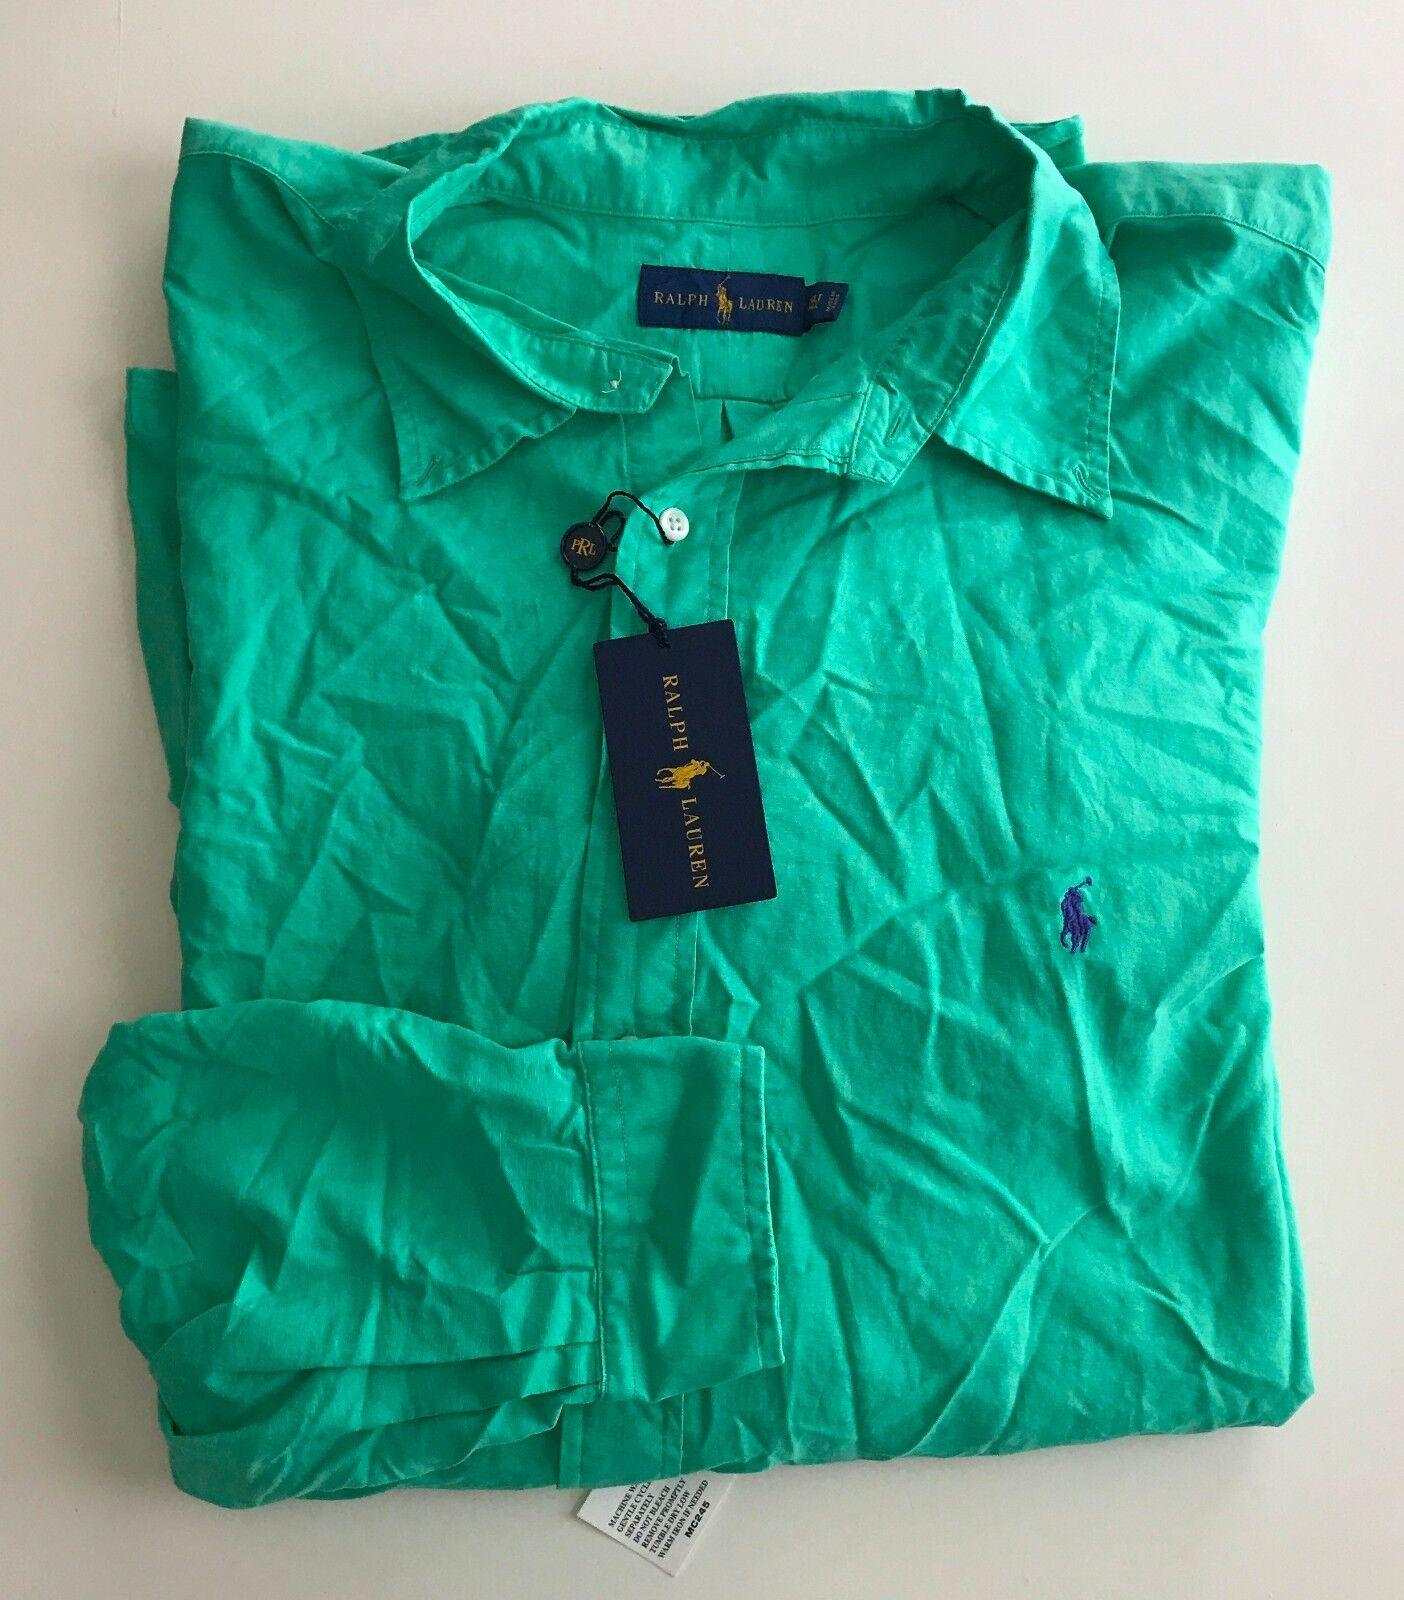 Polo Ralph Lauren Mens Big Tall Garment-Dyed Shirt Pale Kelly Green 3XLT NWD